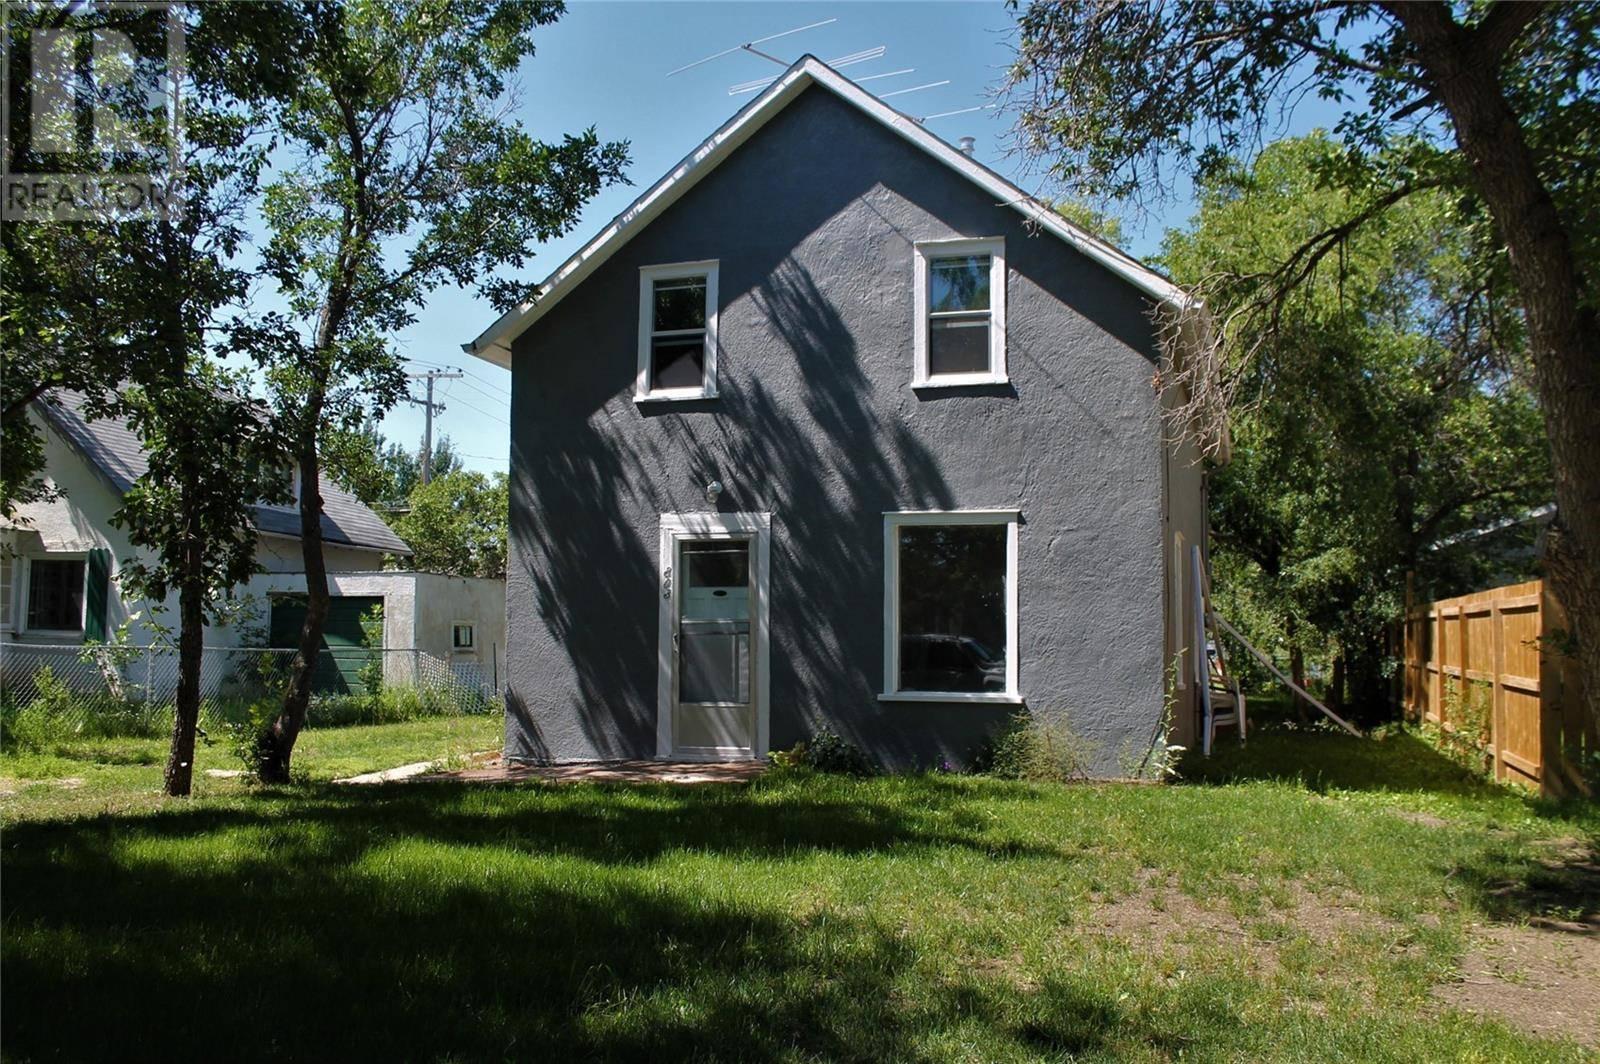 House for sale at 803 George St E Rosetown Saskatchewan - MLS: SK778804